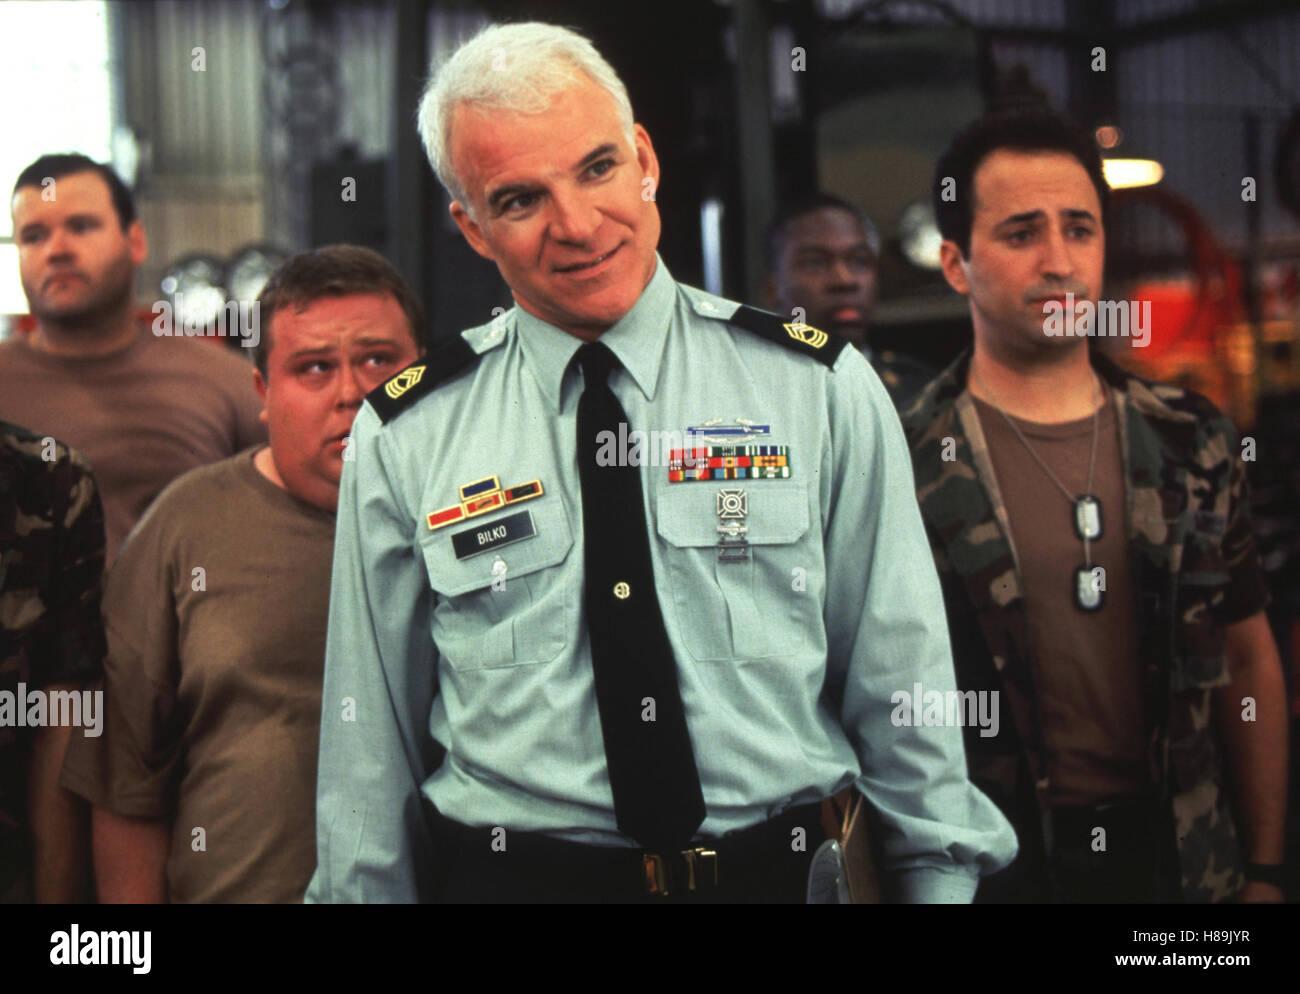 Immer Ärger mit Sergeant Bilko, (SGT. BILKO) USA 1996, Regie: Jonathan Lynn, STEVE MARTIN, Stichwort: Uniform - Stock Image